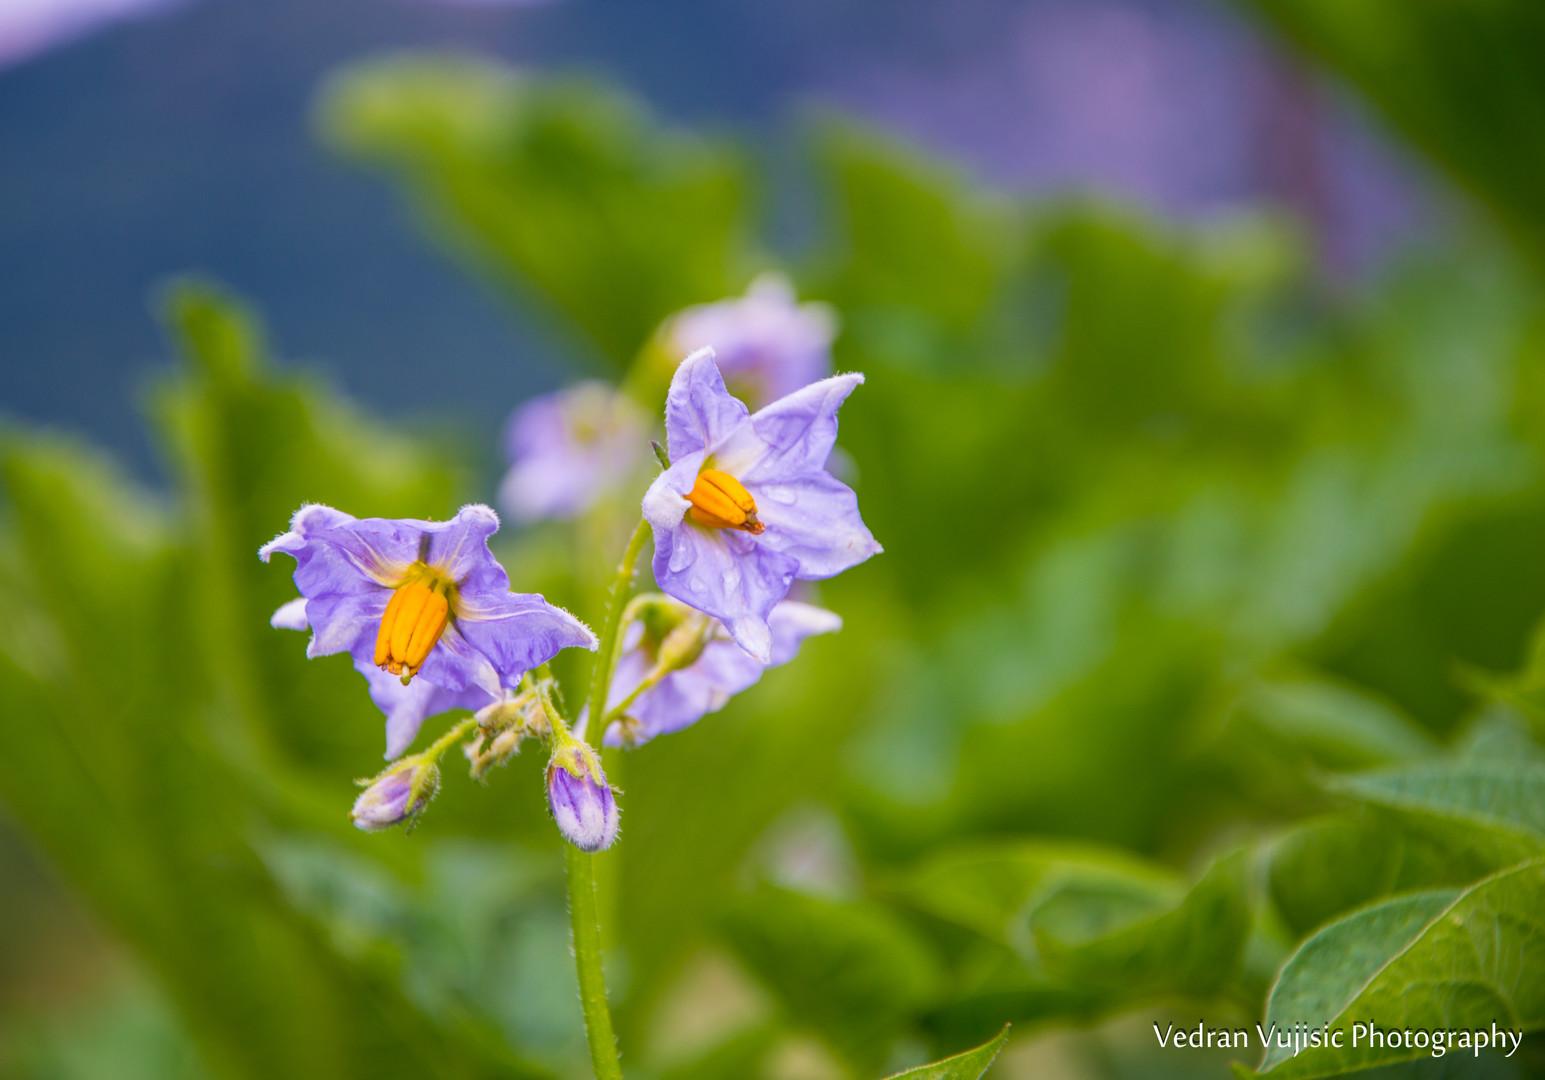 Krompirov cvijet